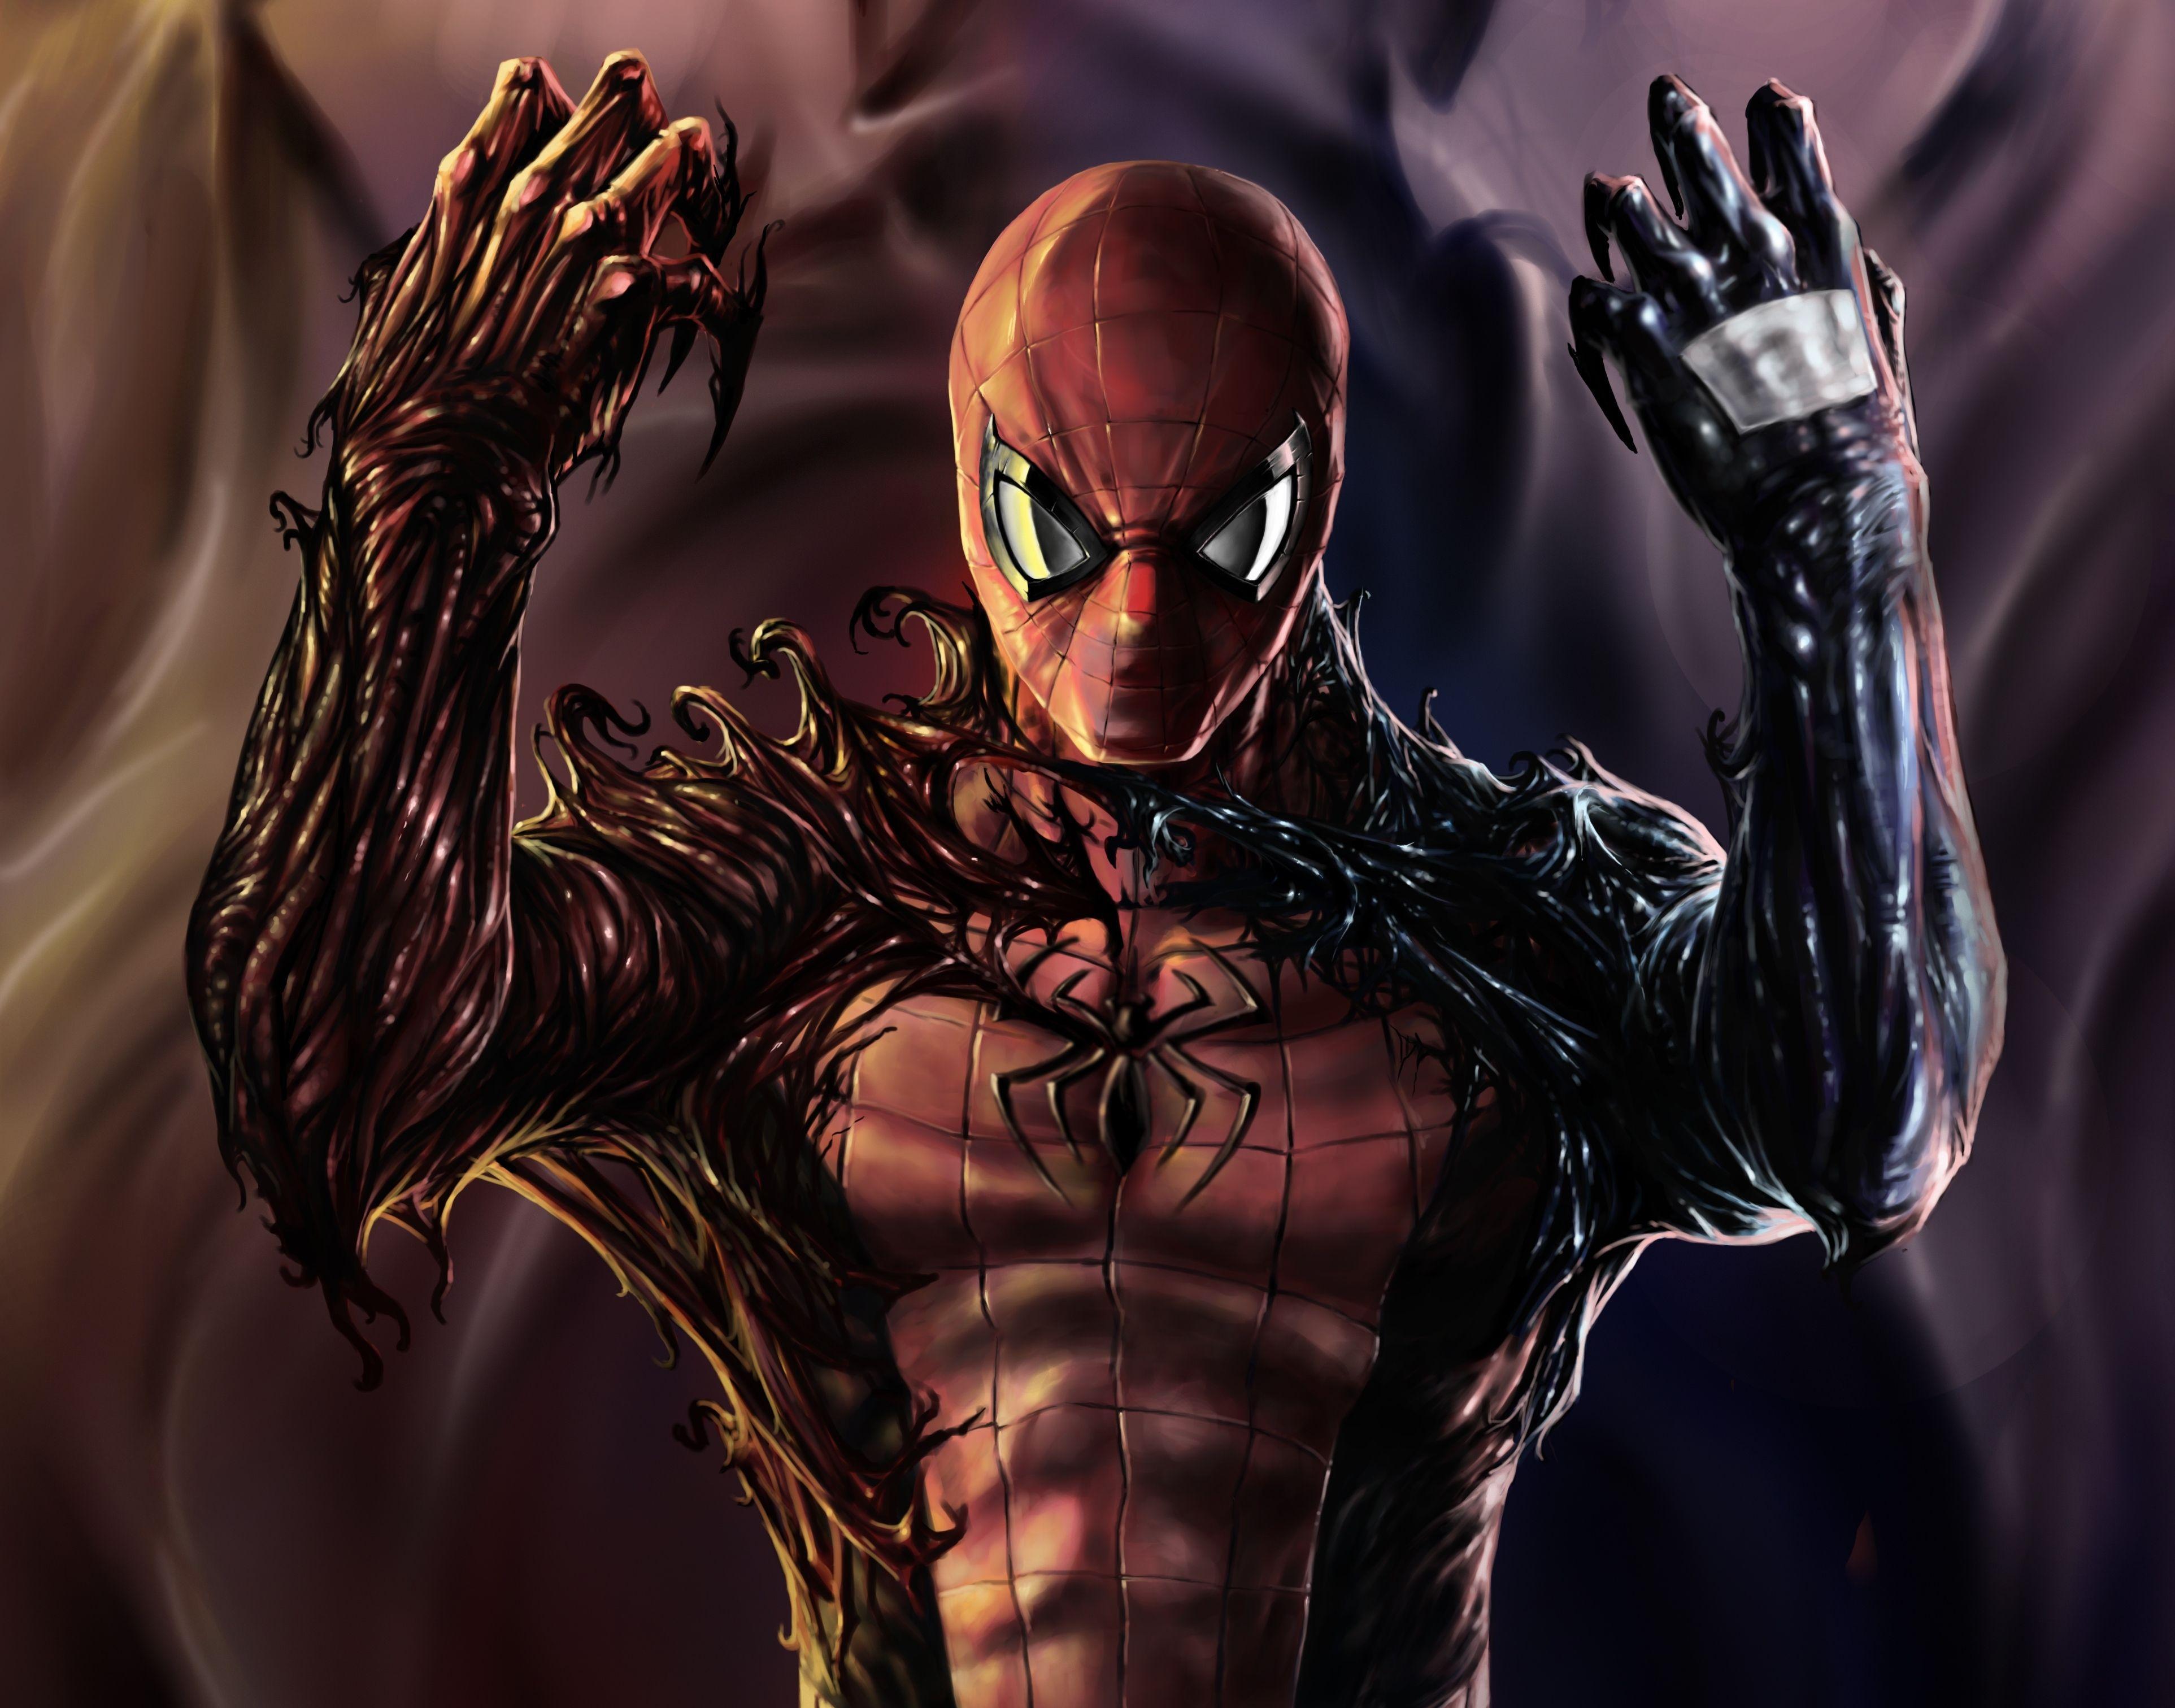 Spider Man Vs Carnage Wallpapers Top Free Spider Man Vs Carnage